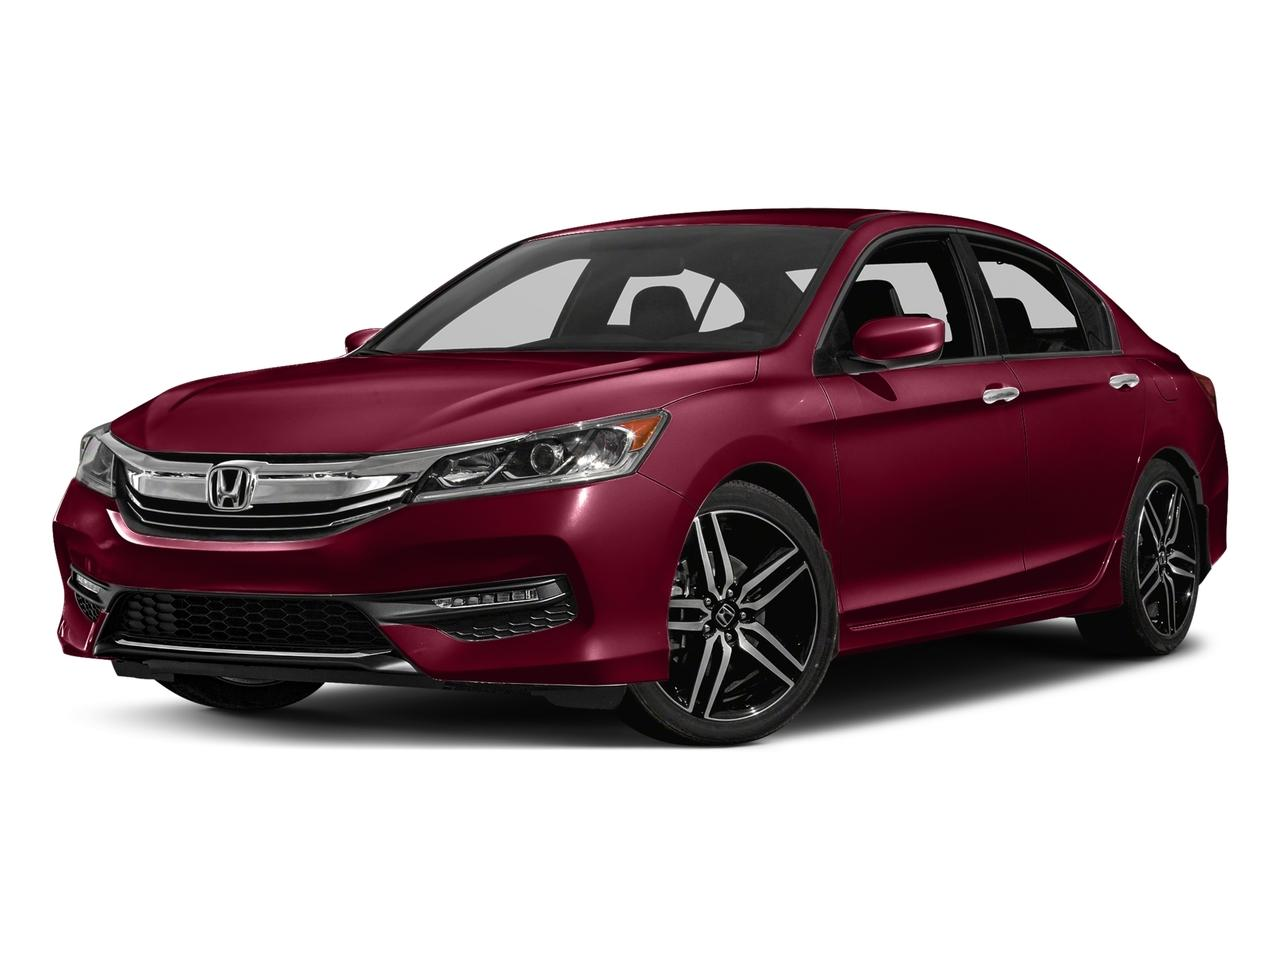 2017 Honda Accord Sedan Vehicle Photo in San Antonio, TX 78238